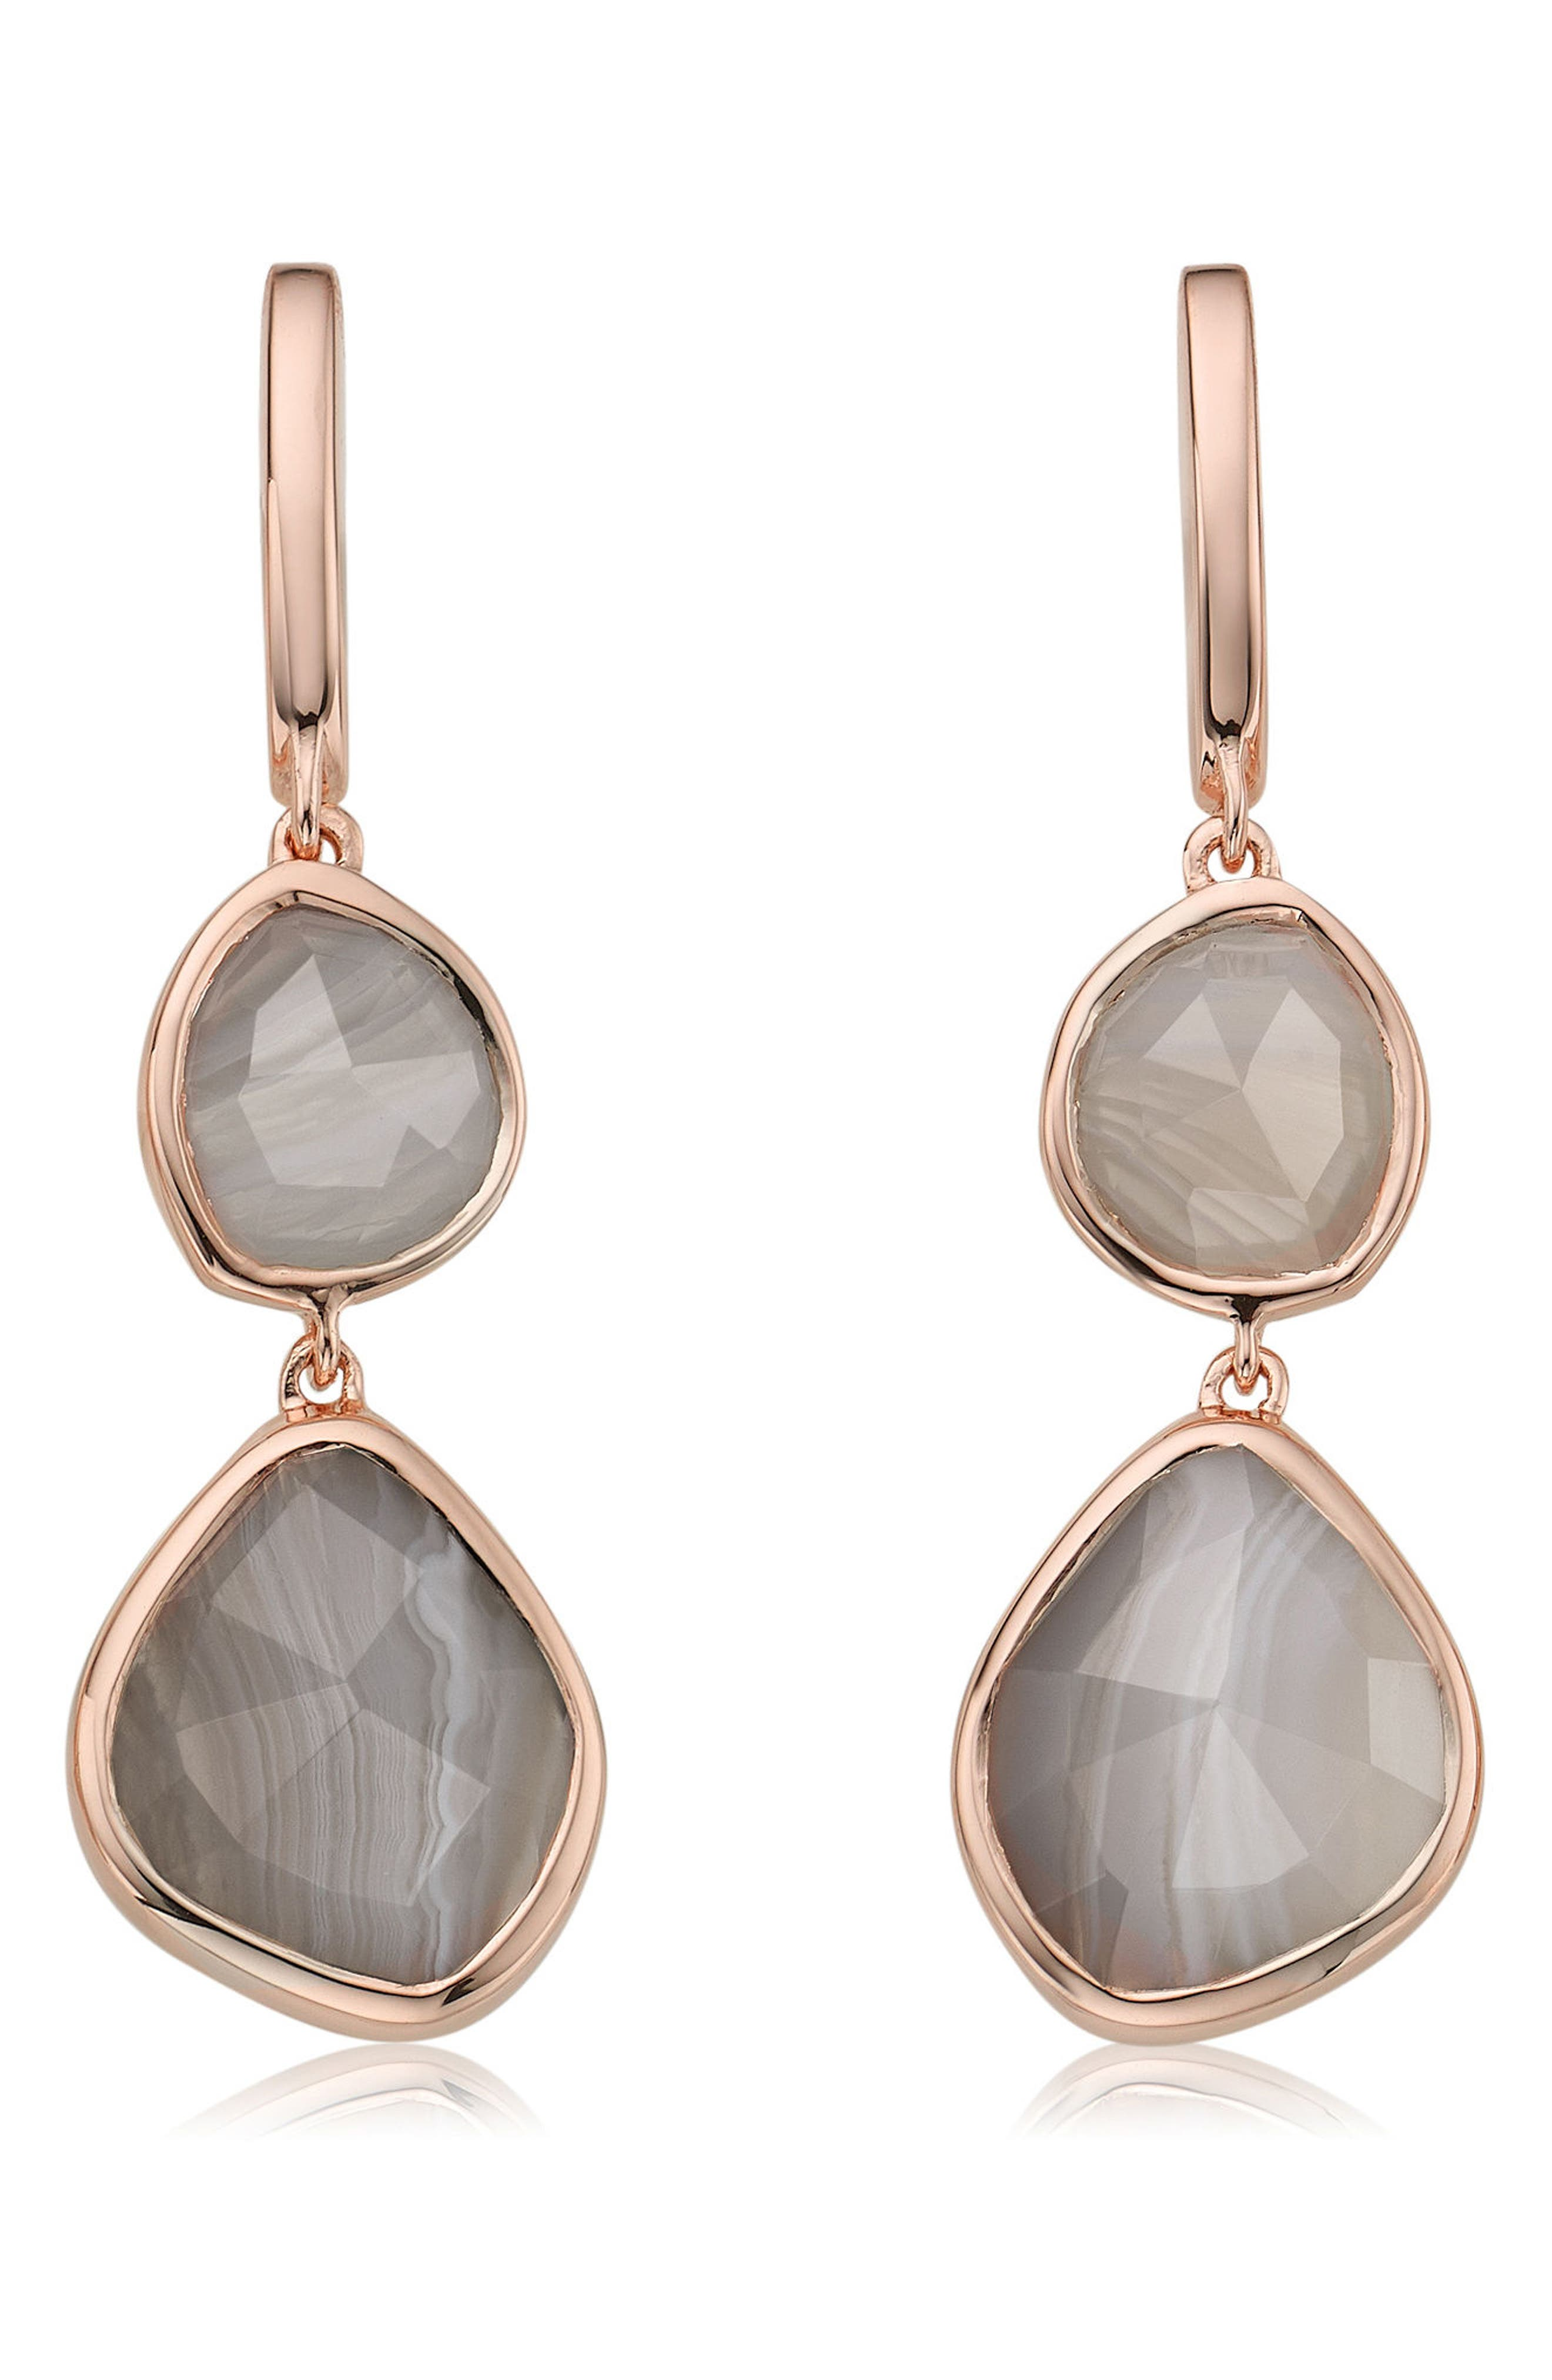 Siren Semiprecious Stone Drop Earrings,                         Main,                         color, Grey Agate/ Rose Gold